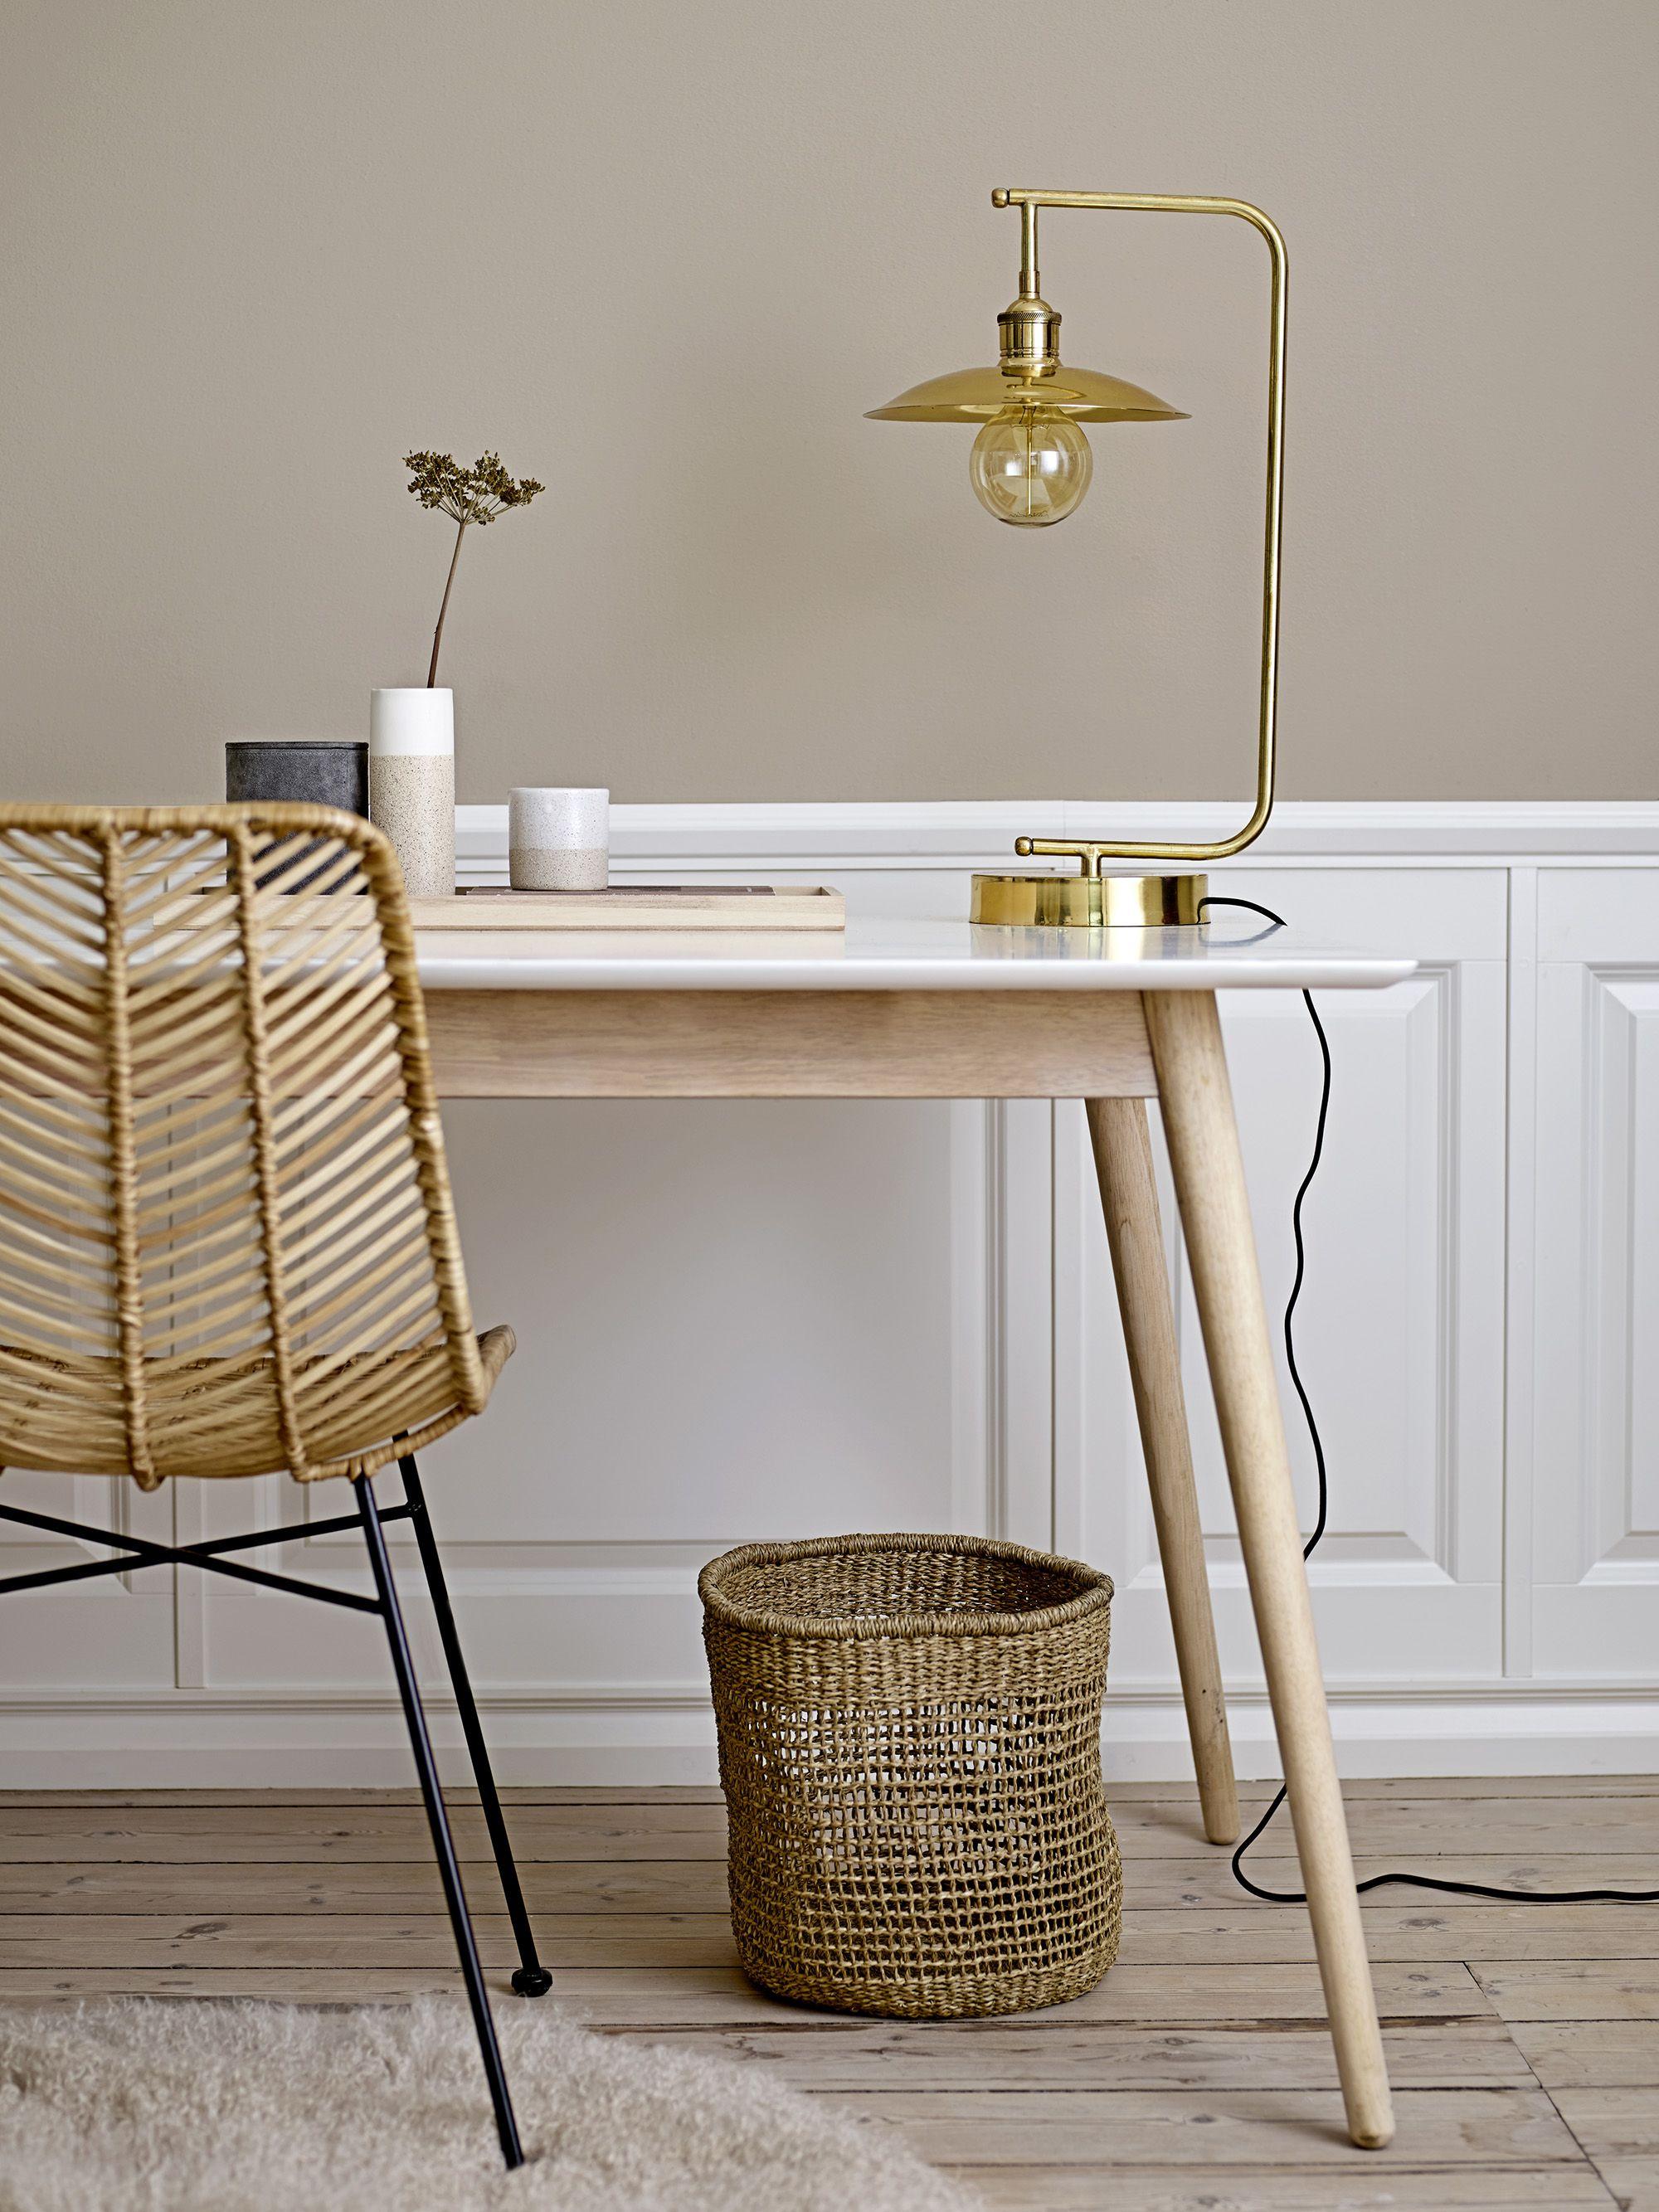 Golden lamp 3 Design by Bloomingville